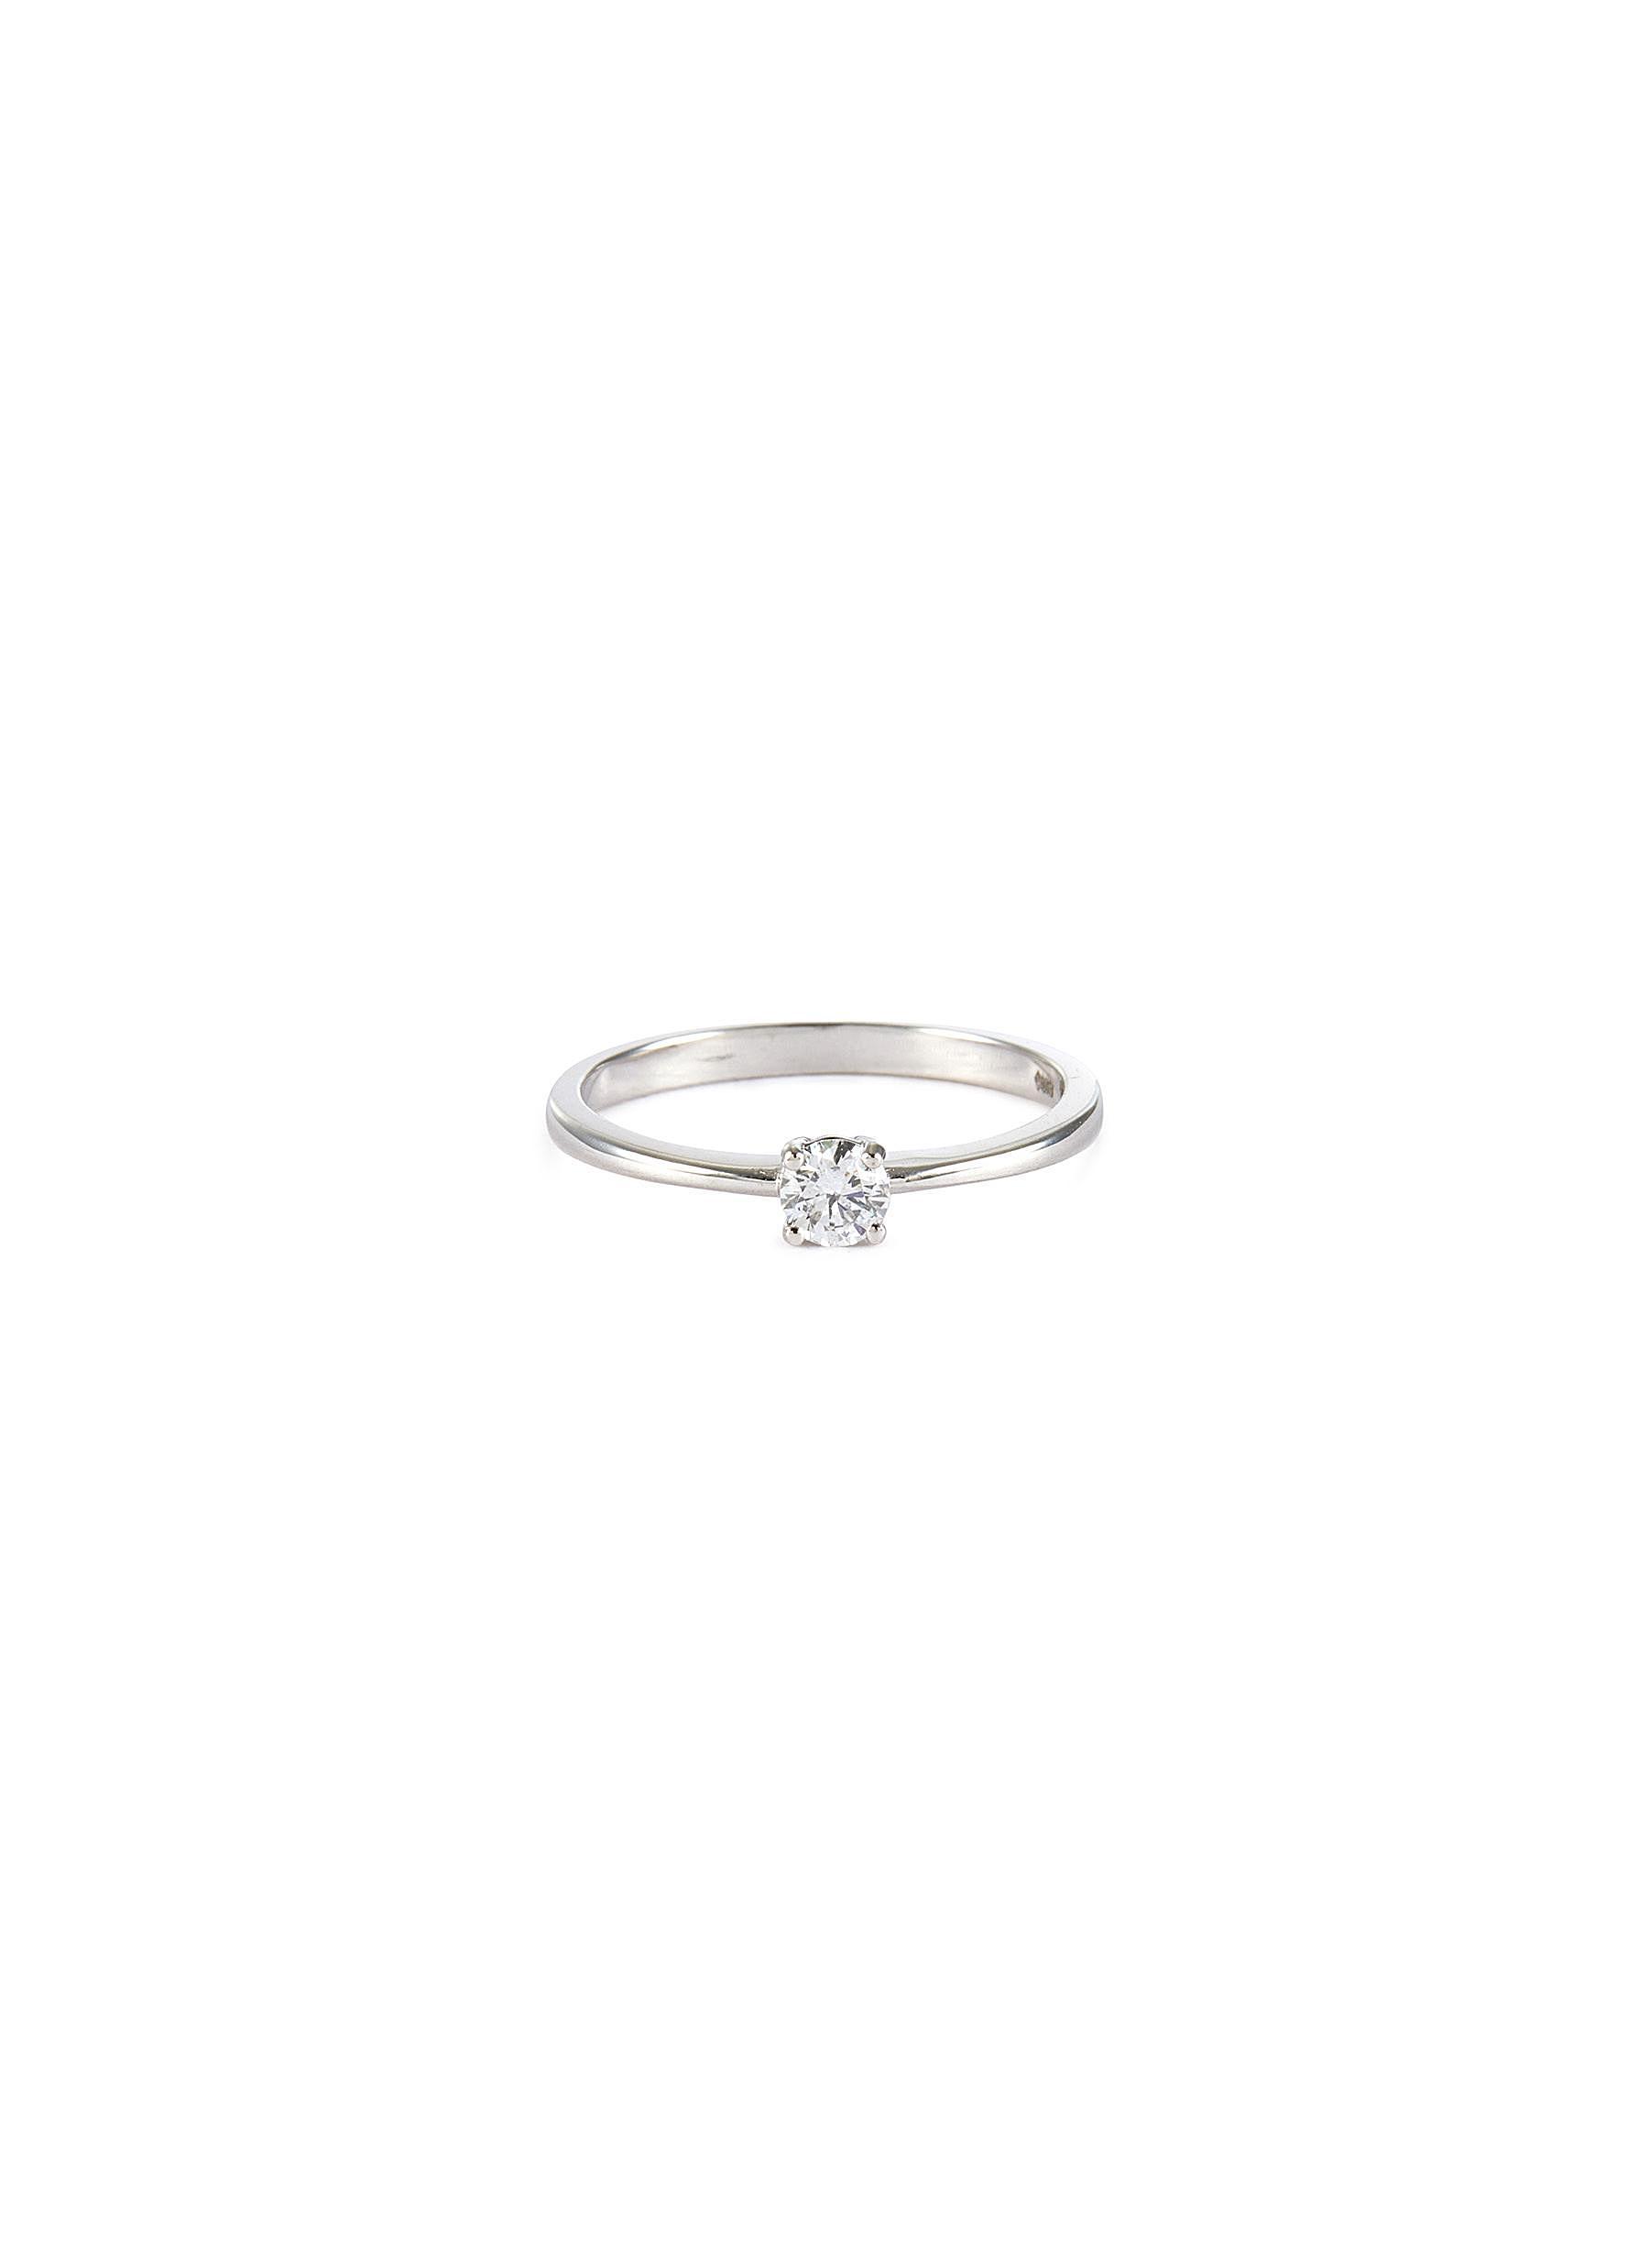 'Alora' lab grown diamond 9k white gold ring